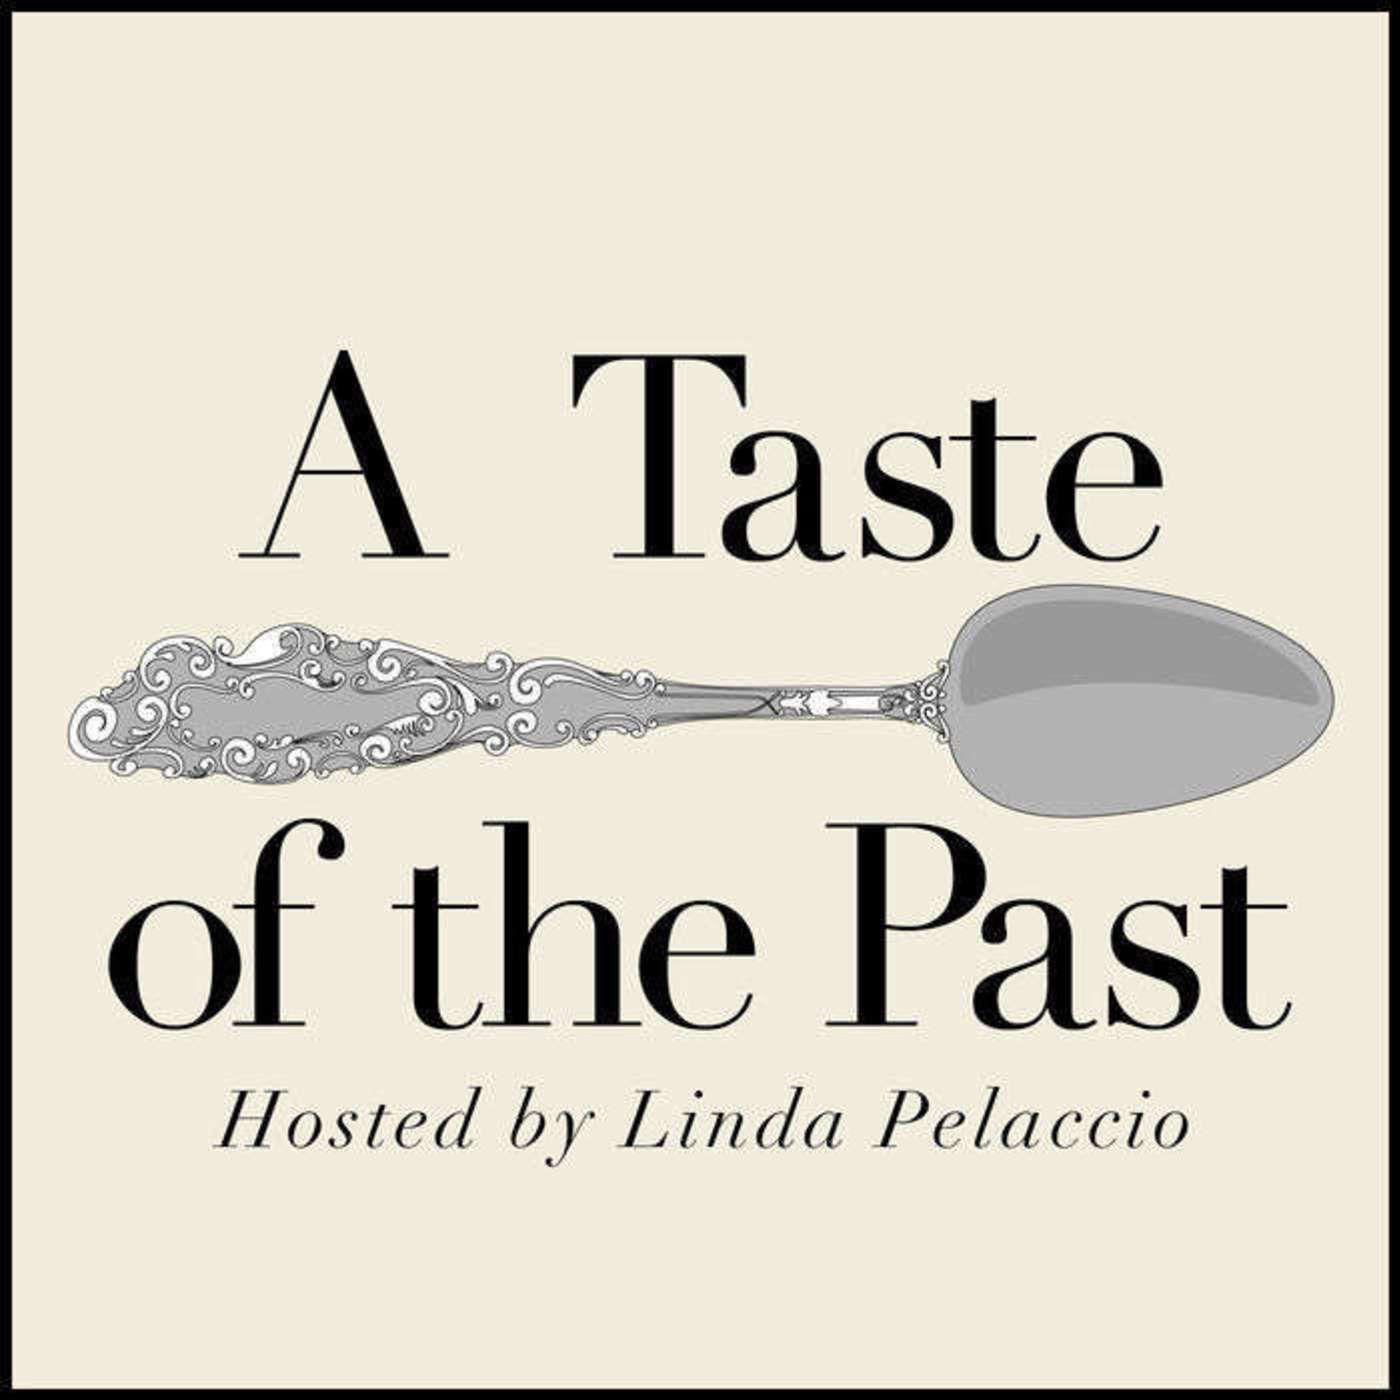 Episode 63: The Evolving Cuisine of Israel